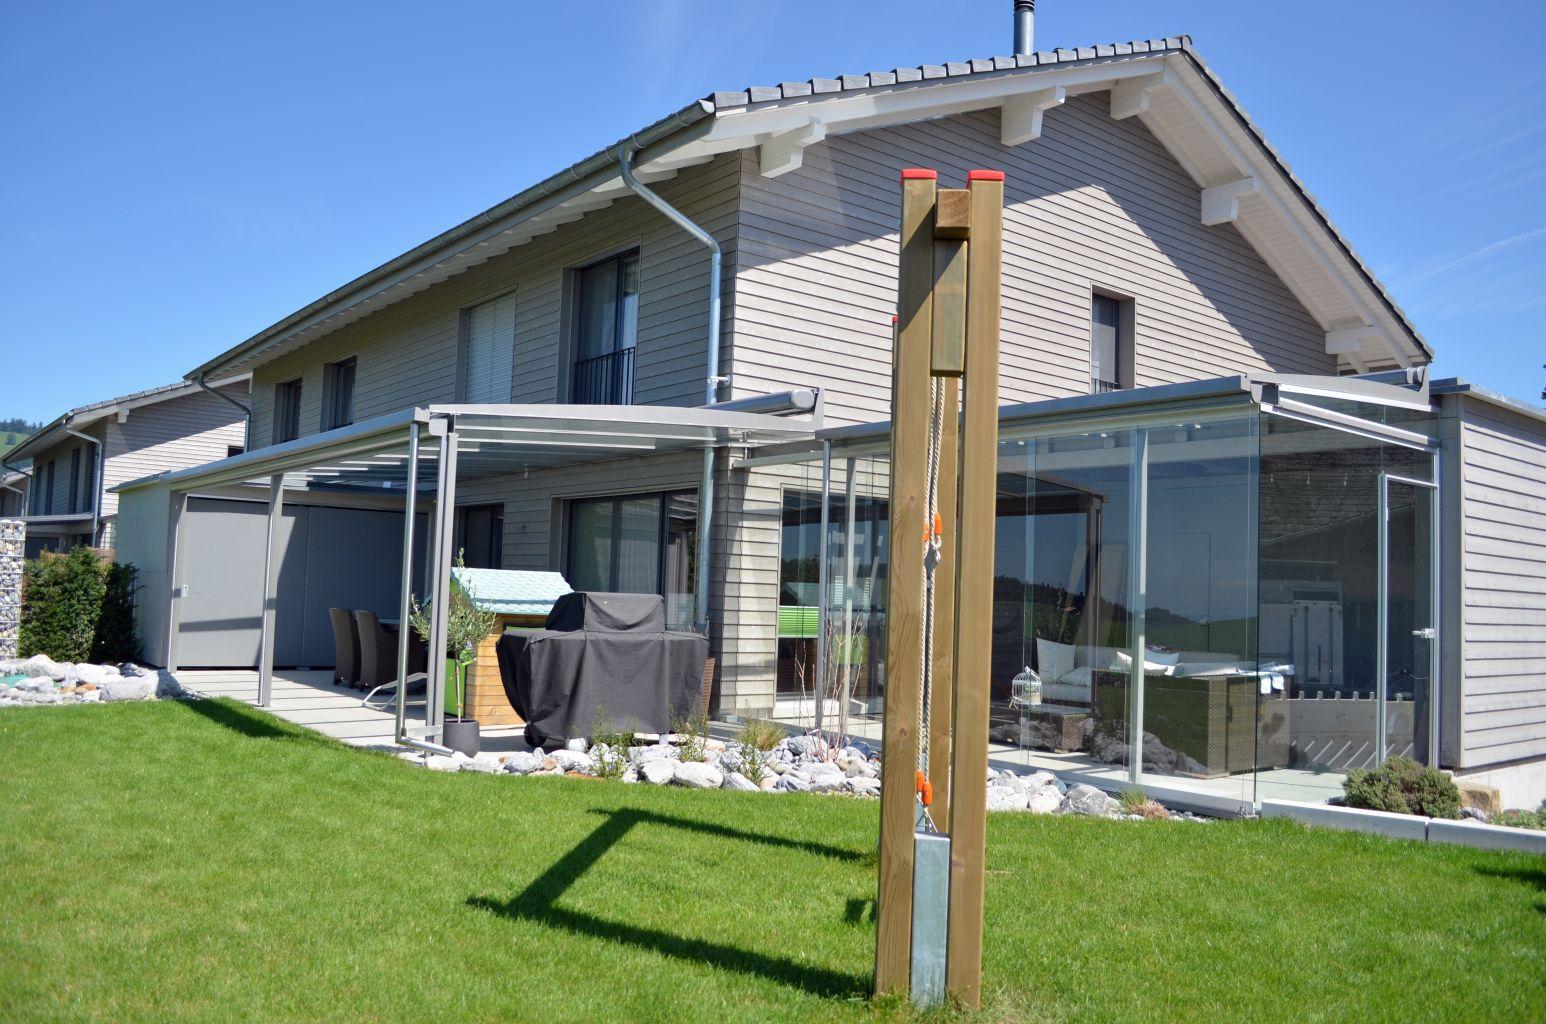 wintergarten unisoliert soltermann ag. Black Bedroom Furniture Sets. Home Design Ideas